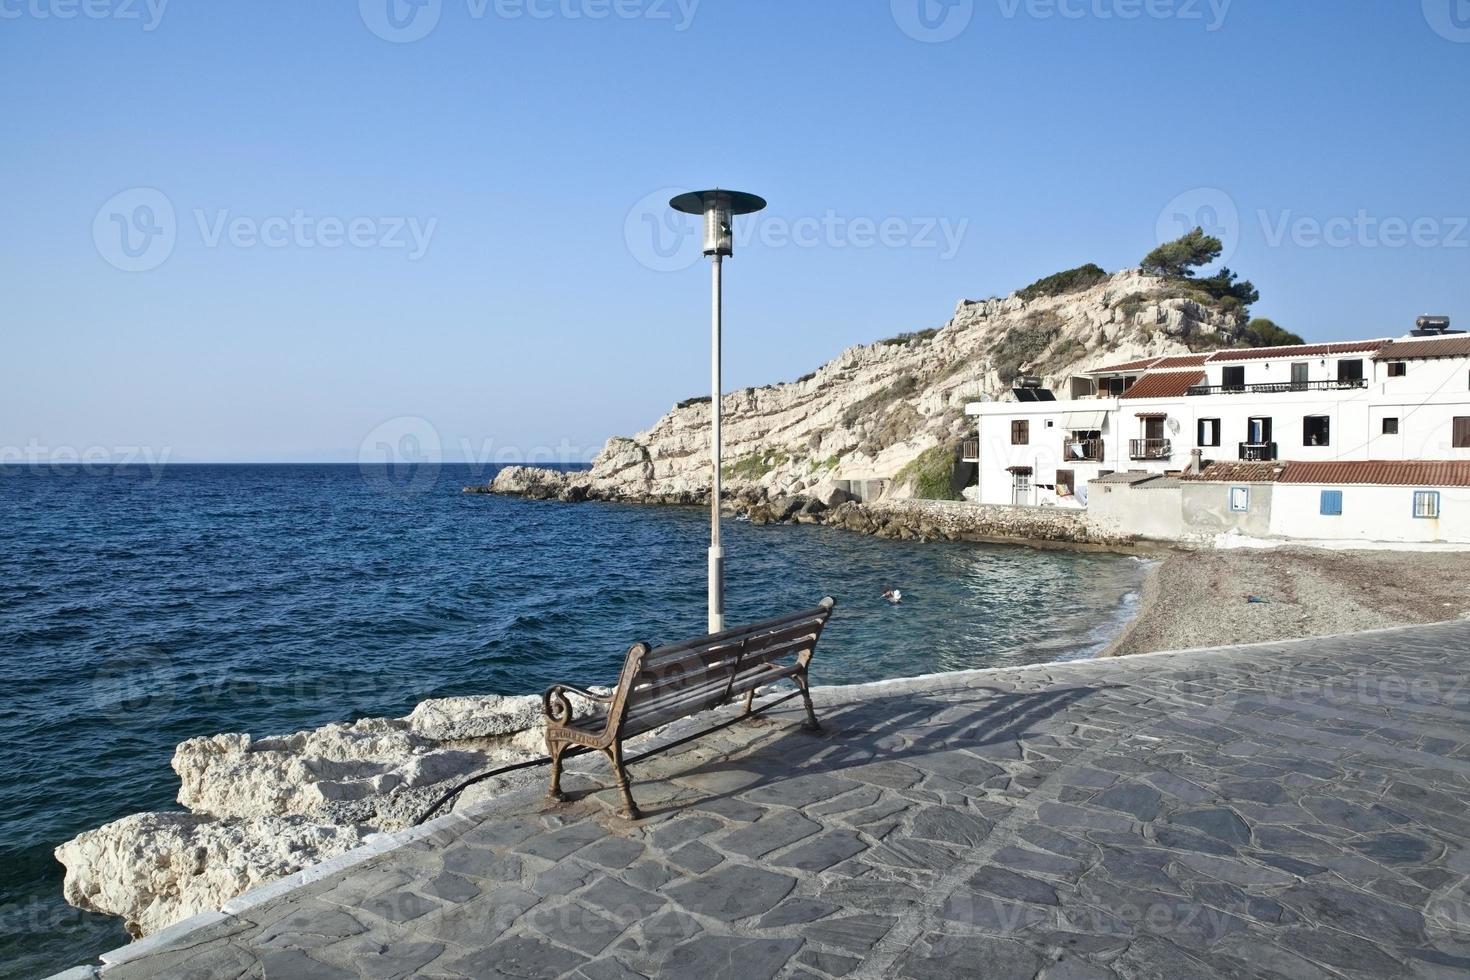 Beach in the town of Kokkari, Samos, Greece photo